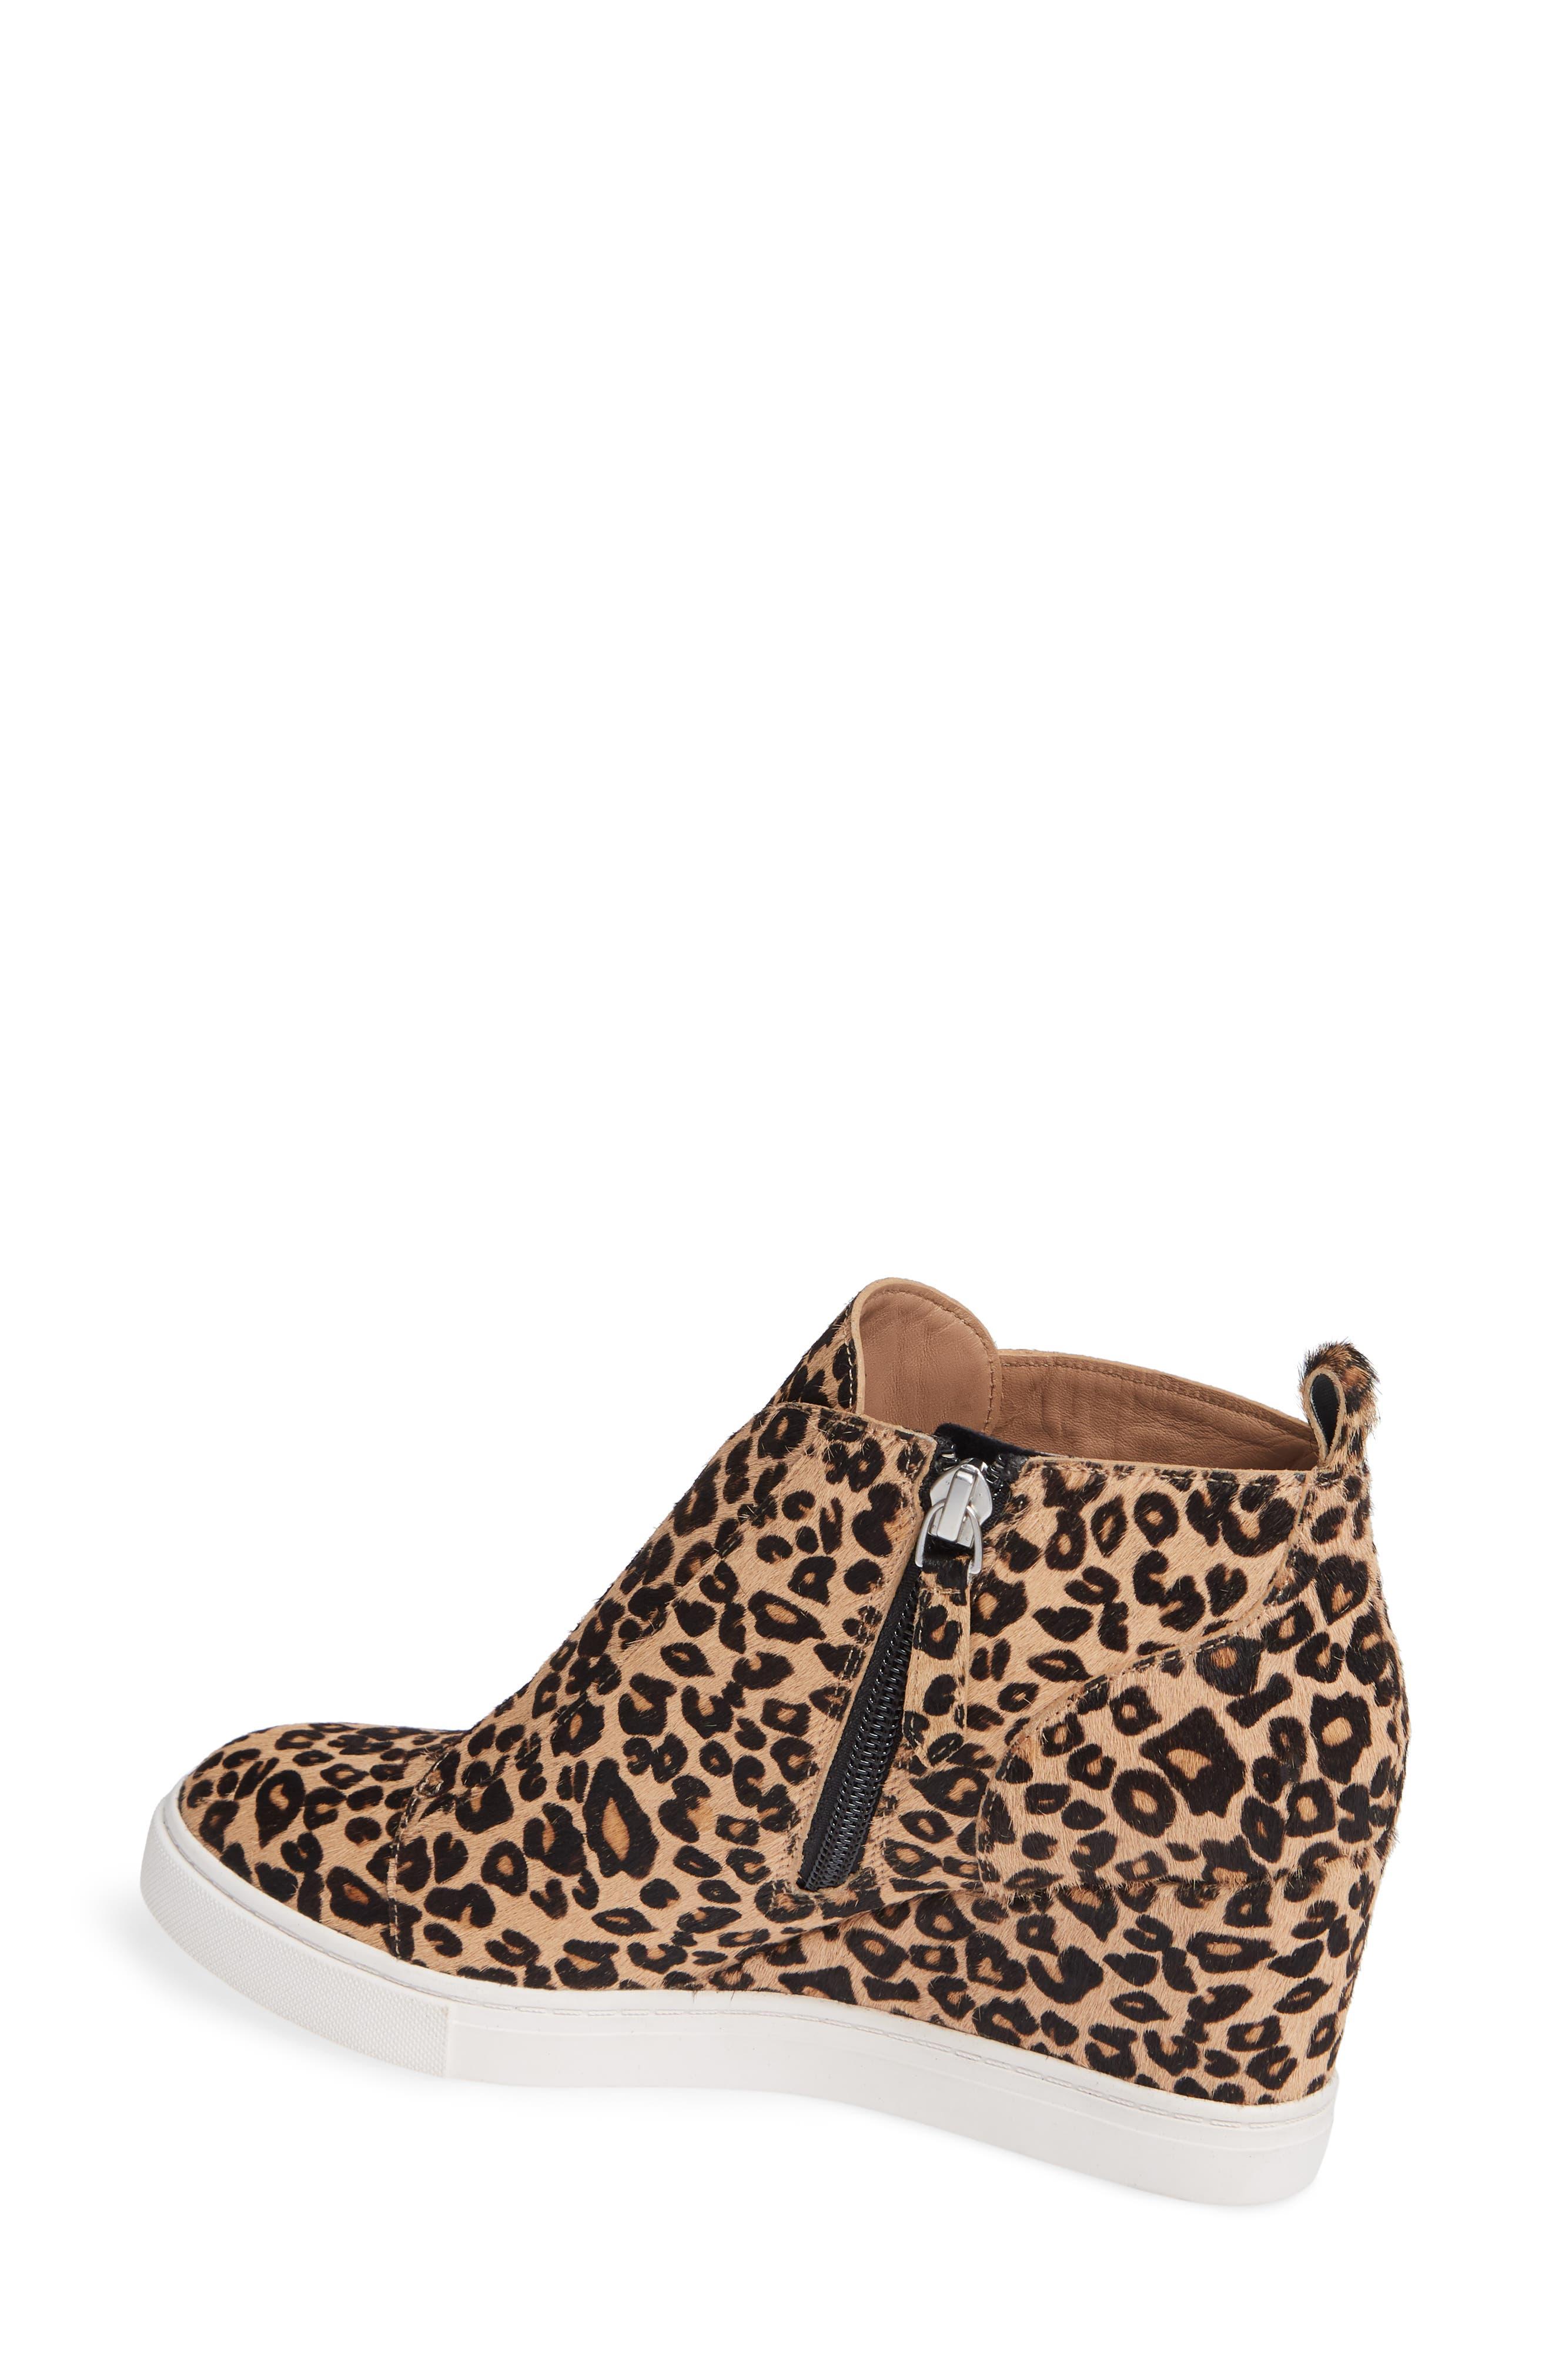 Felicia III Genuine Calf Hair Wedge Sneaker,                             Alternate thumbnail 2, color,                             LEOPARD PRINT HAIR CALF